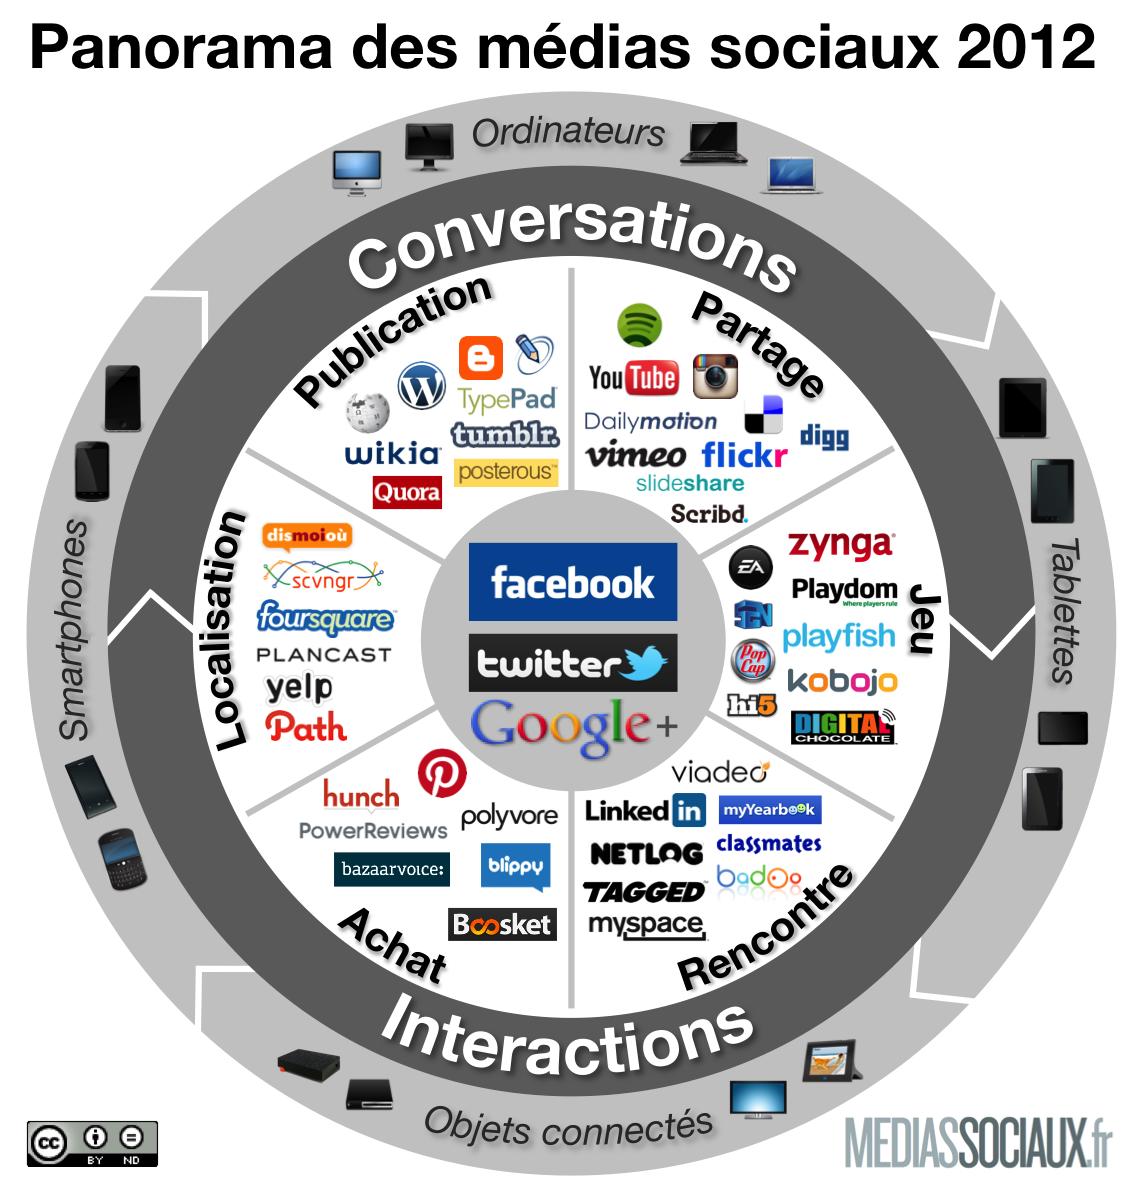 Médias sociaux en 2012